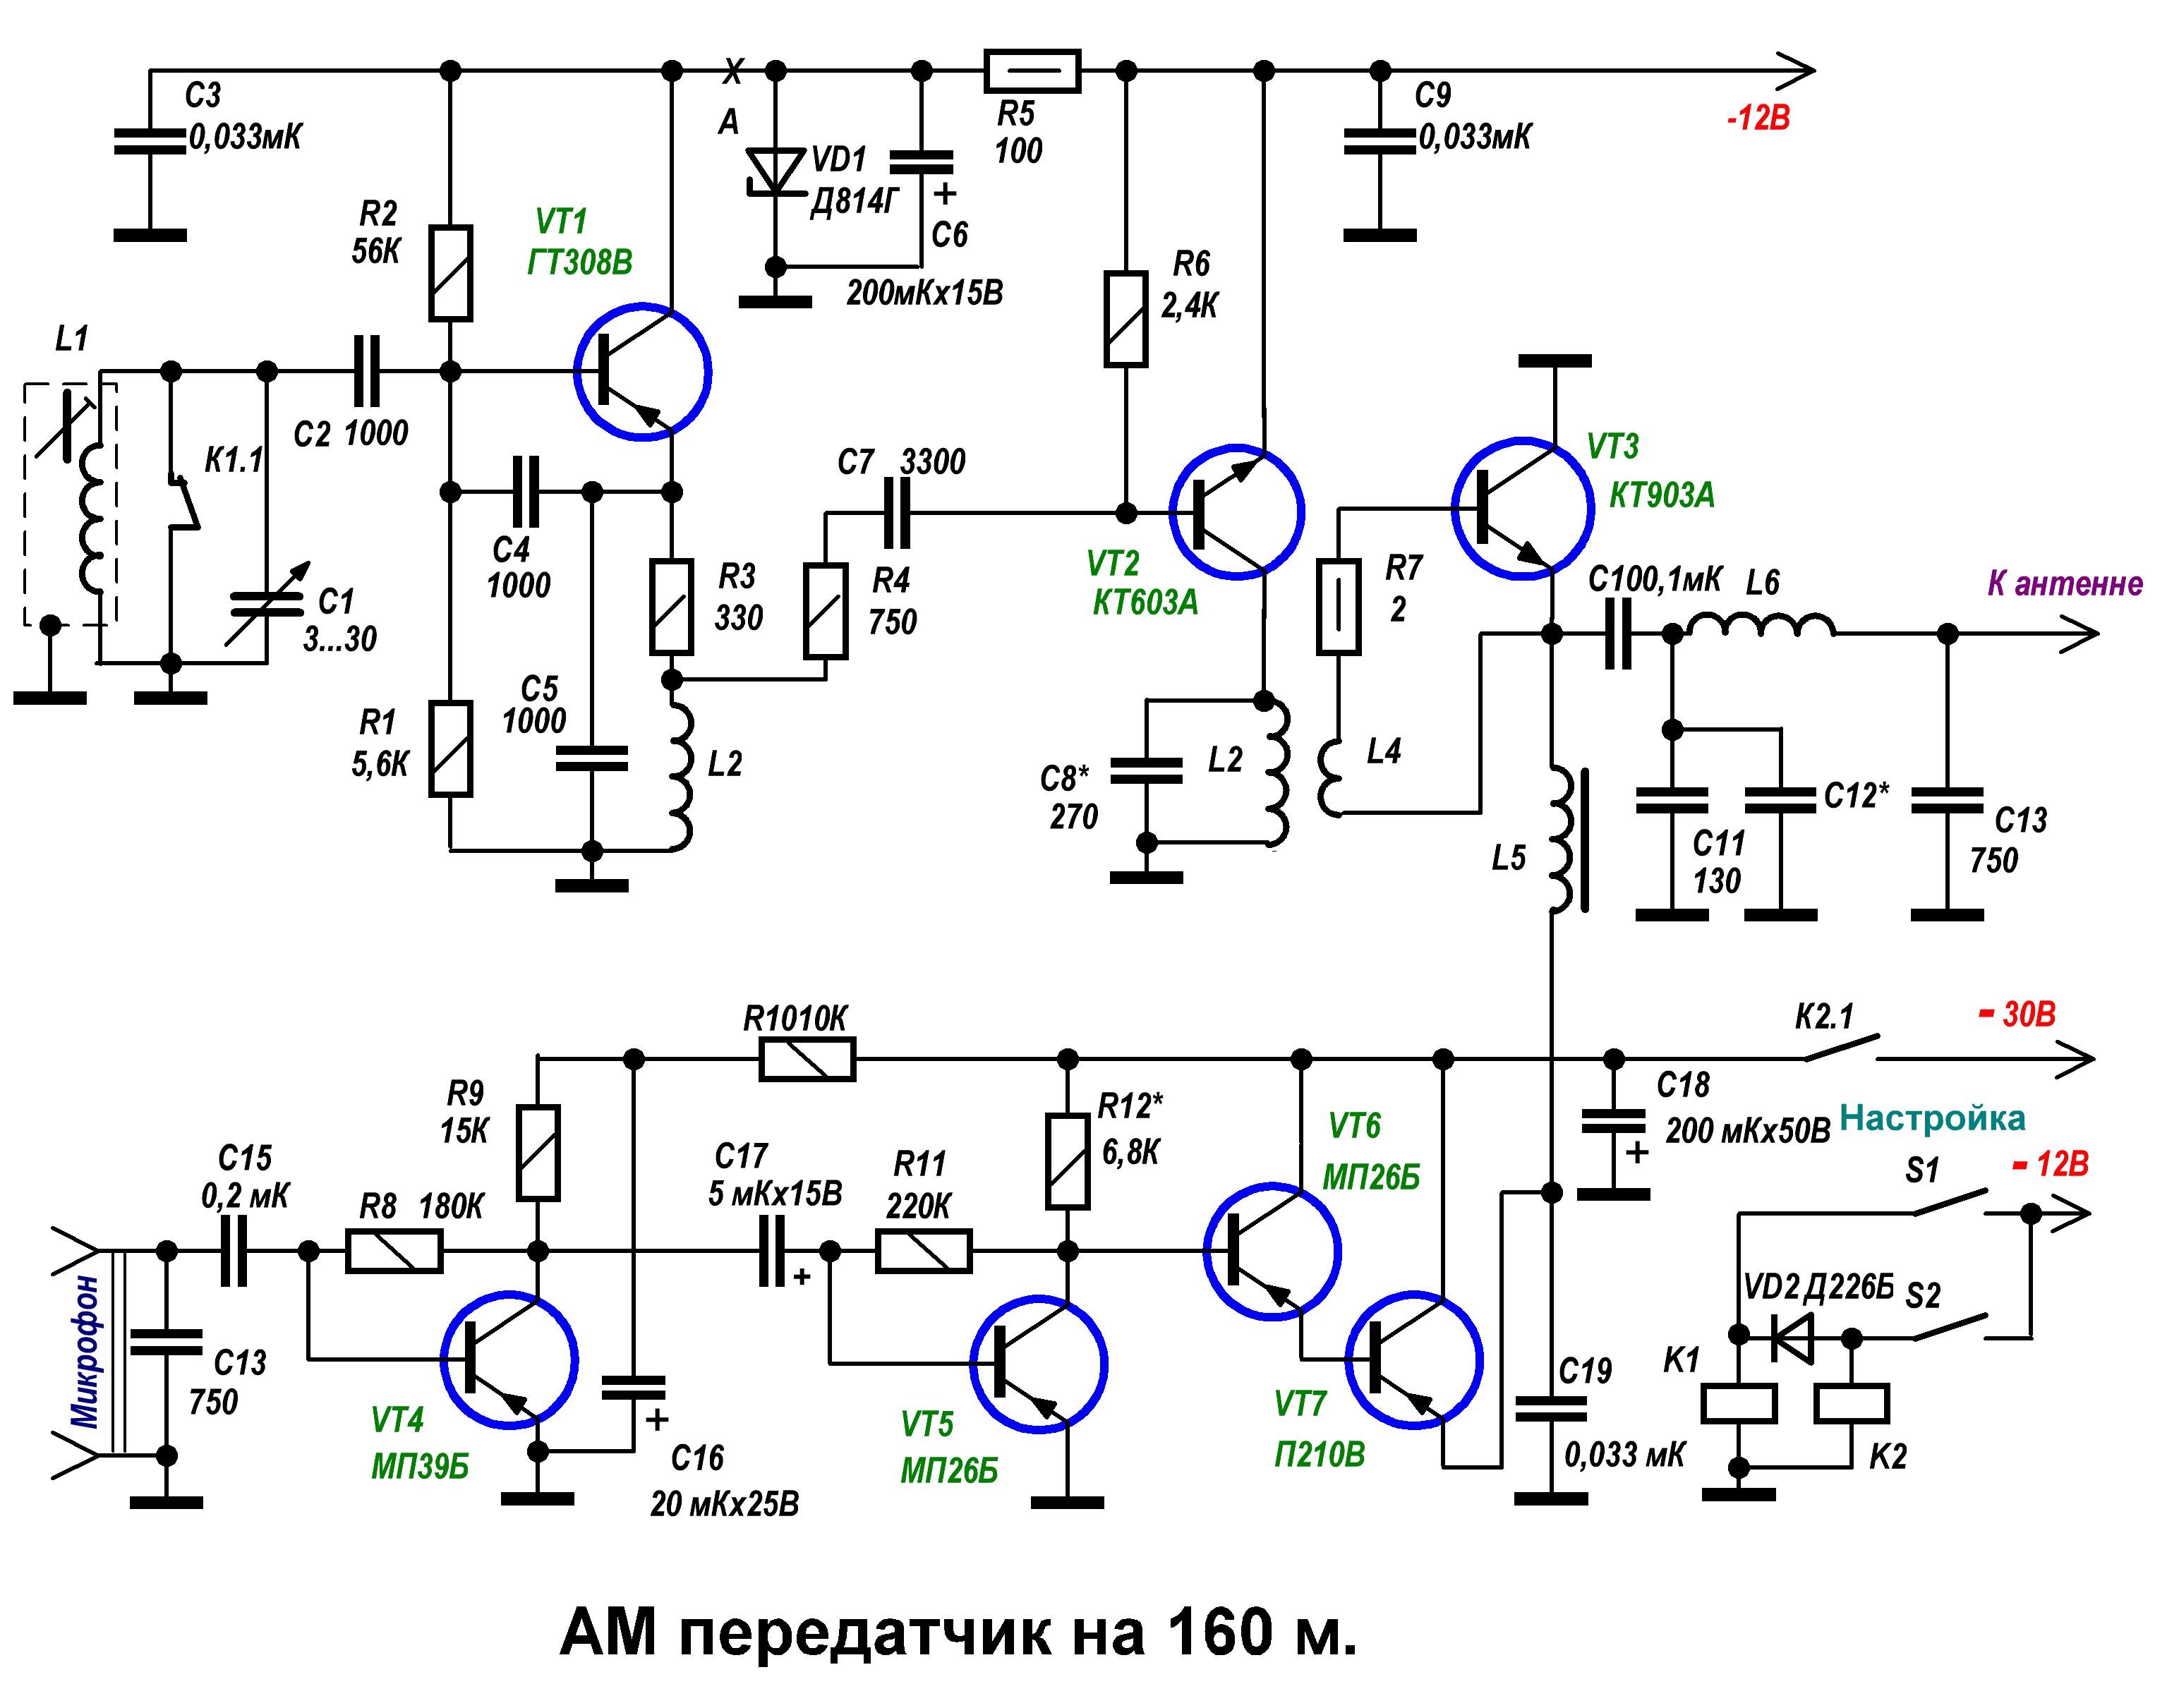 Схема трансивера на 160 метров